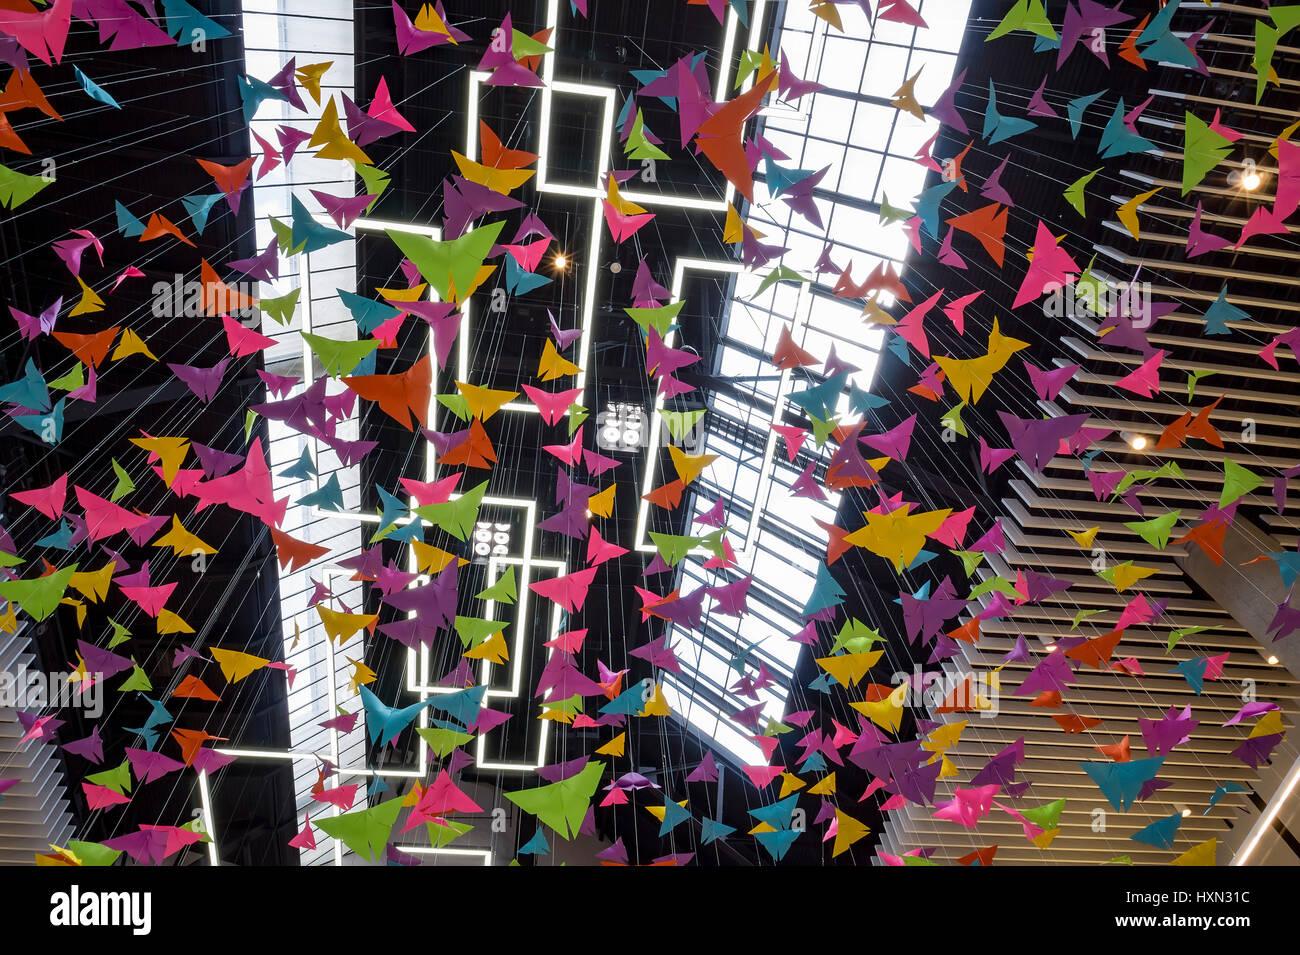 Los Angeles, MAR 26: The beautiful colorful paper art of Santa Anita Mall on MAR 26, 2017 at Los Angeles, California - Stock Image